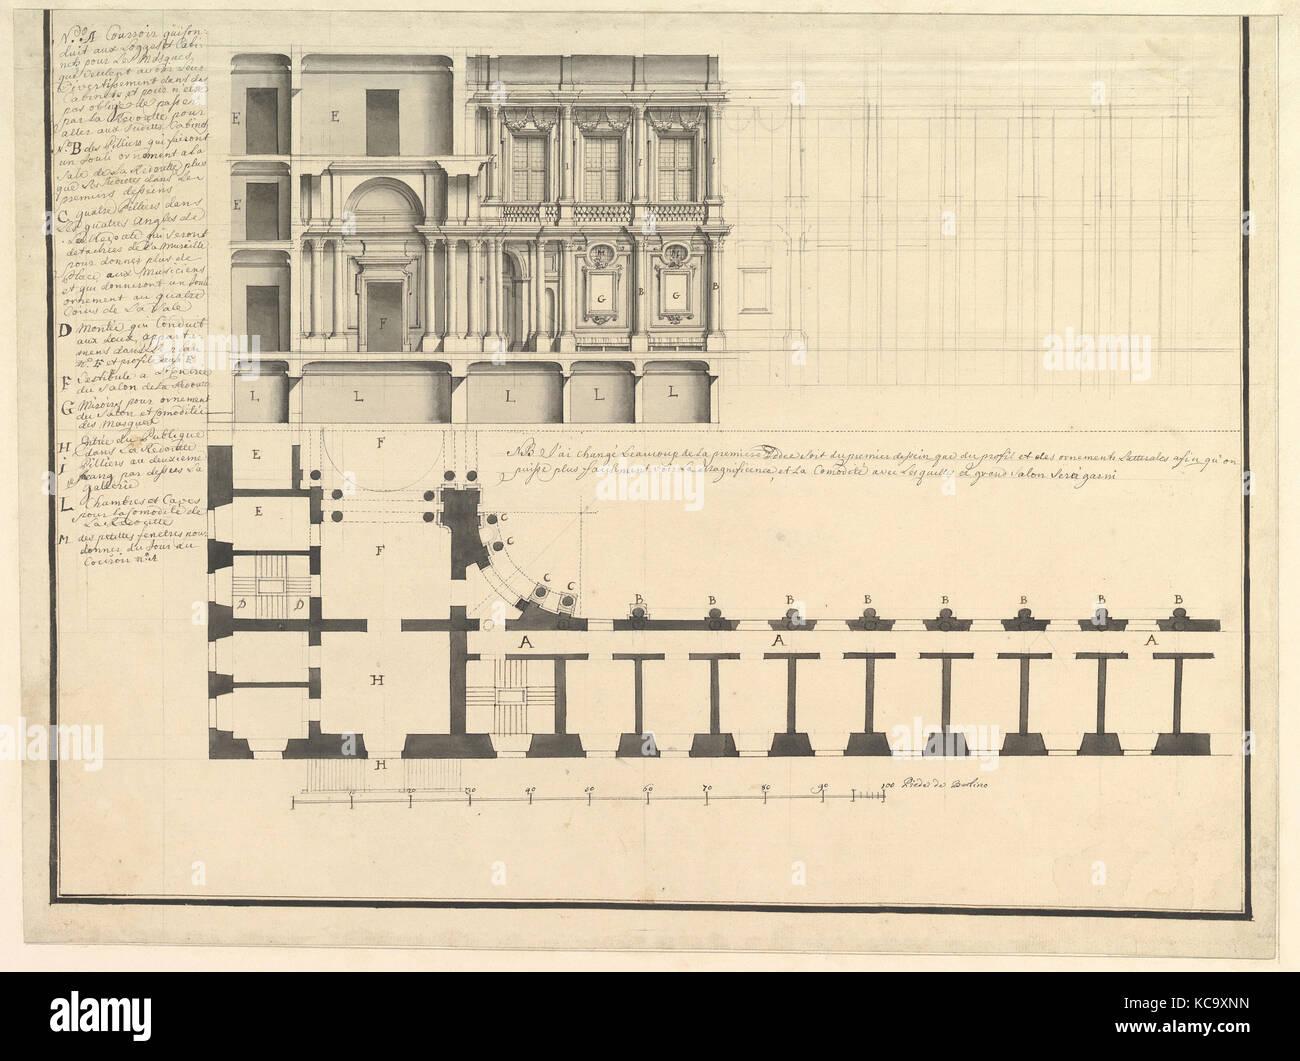 Half Longitudinal Section and Half Plan, Workshop of Giuseppe Galli Bibiena, ca. 1750 - Stock Image